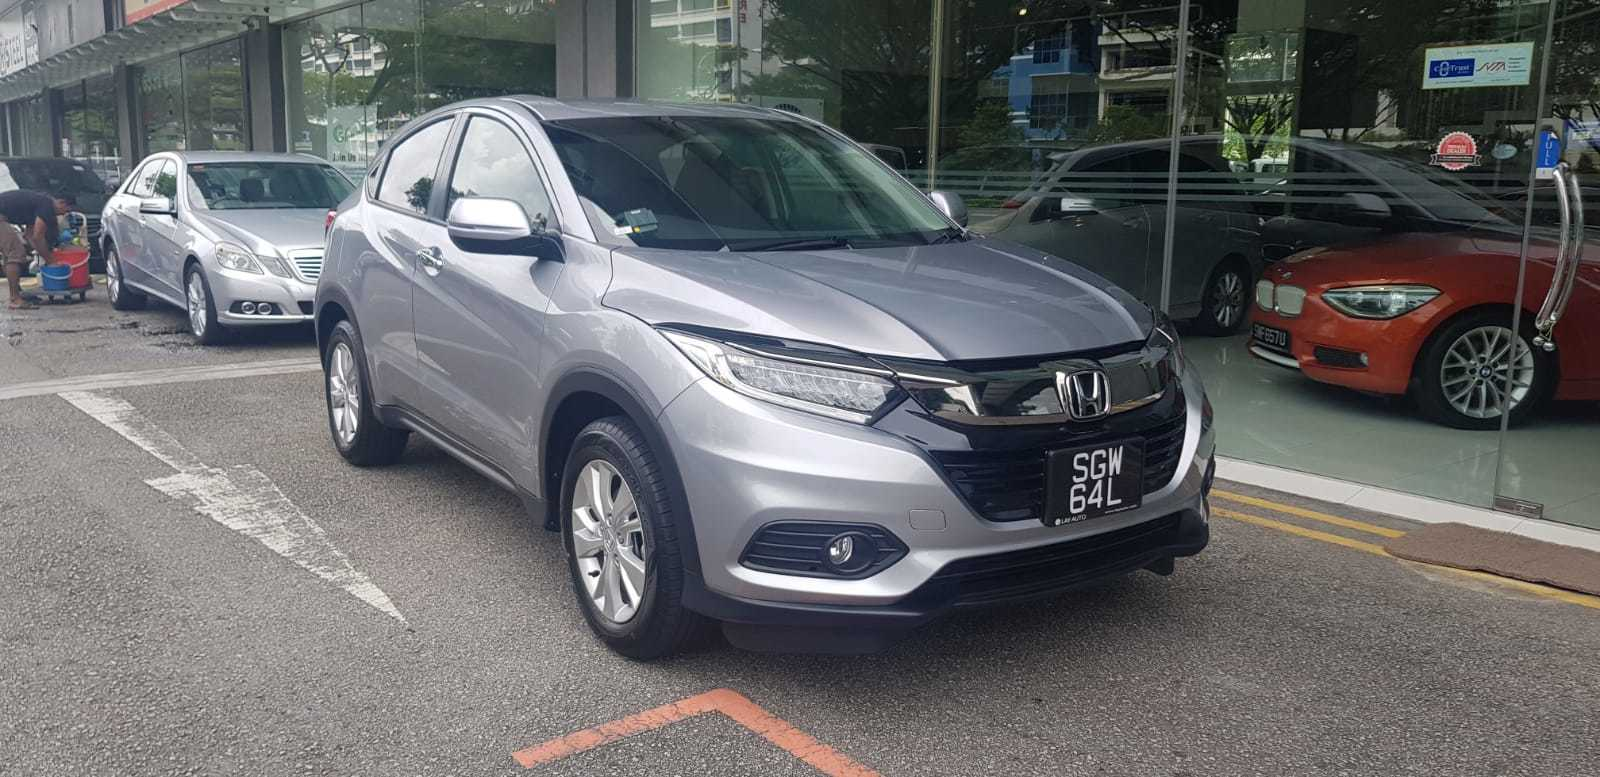 Honda Vezel 2018 Facelift Cars Vehicle Rentals On Carousell